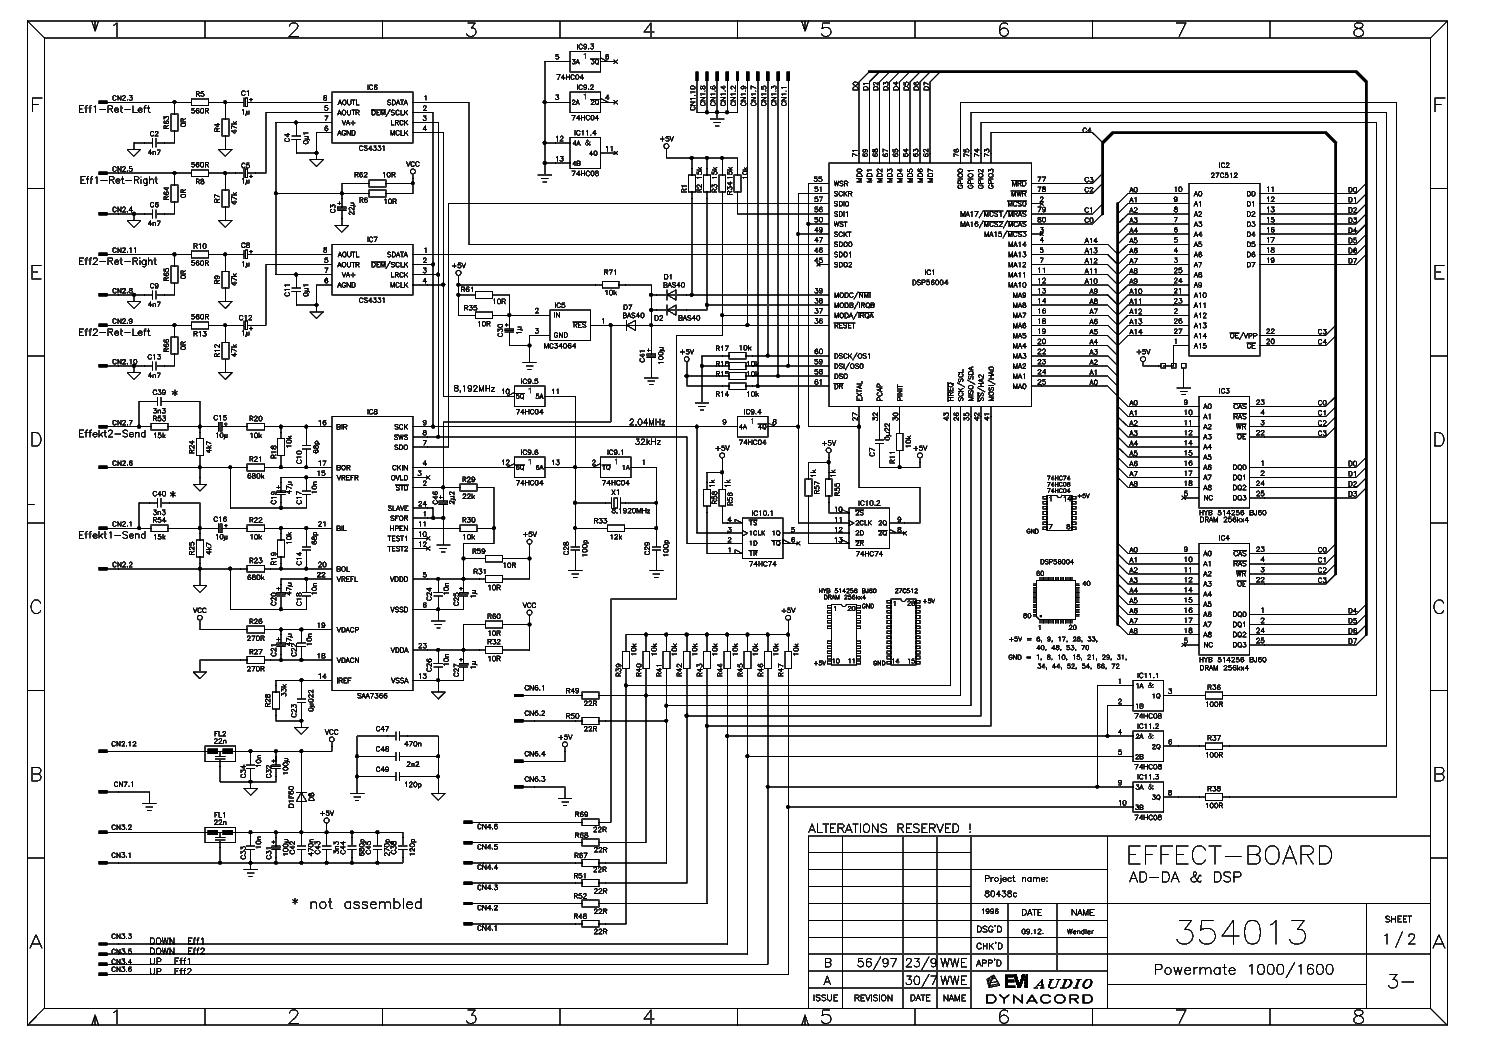 Dynacord Pm1600 Sch Service Manual Download Schematics